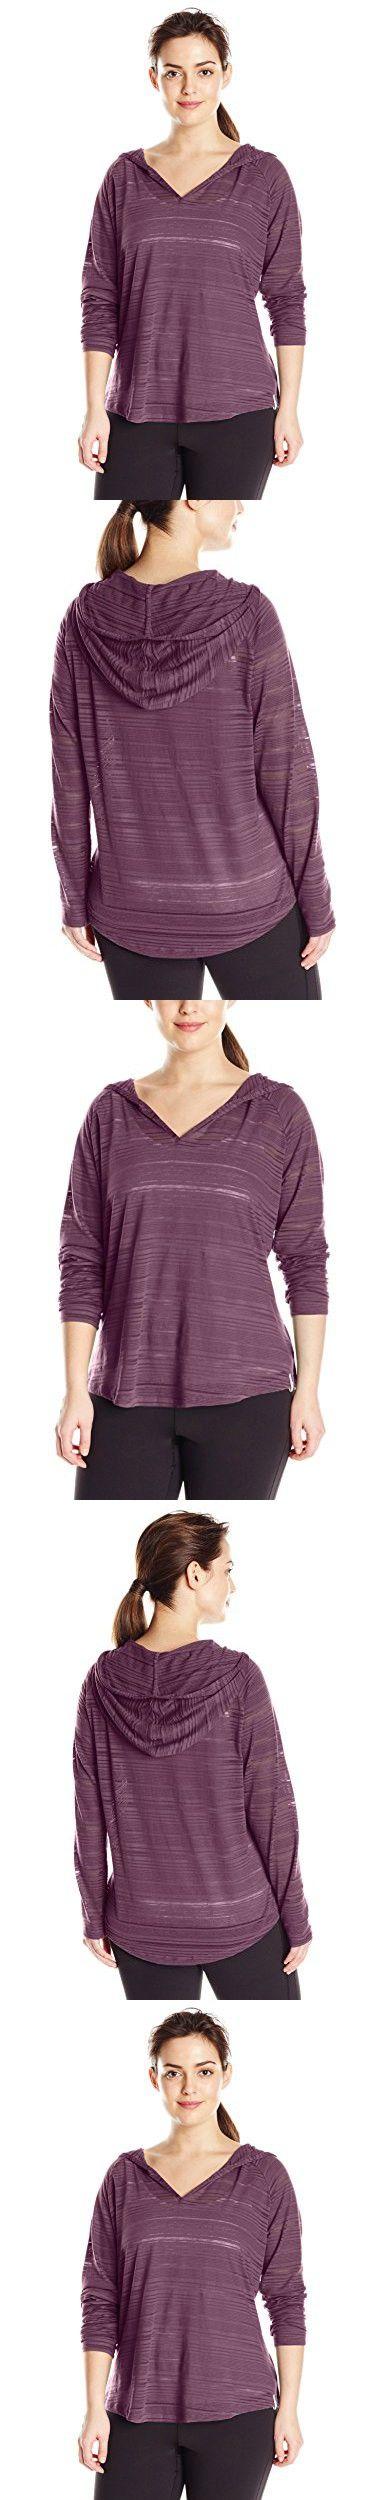 Columbia Women's Inner Luminosity Hoodie (Plus Size), Dusty Purple, 2X